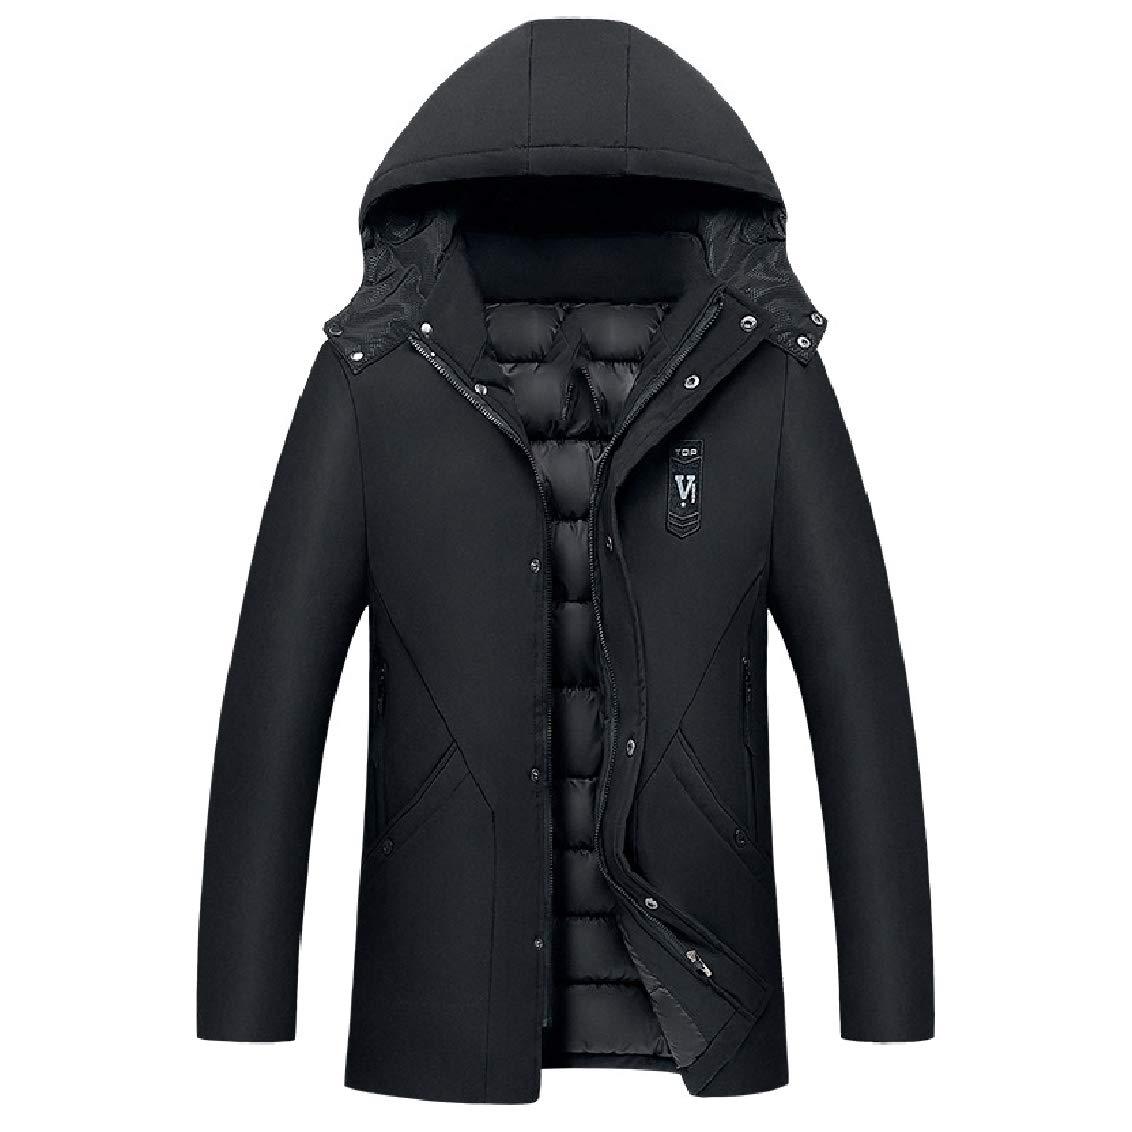 Freely Mens Mid-Long Outwear Winter Keep Warm Trim-Fit Hood Anorak Jacket